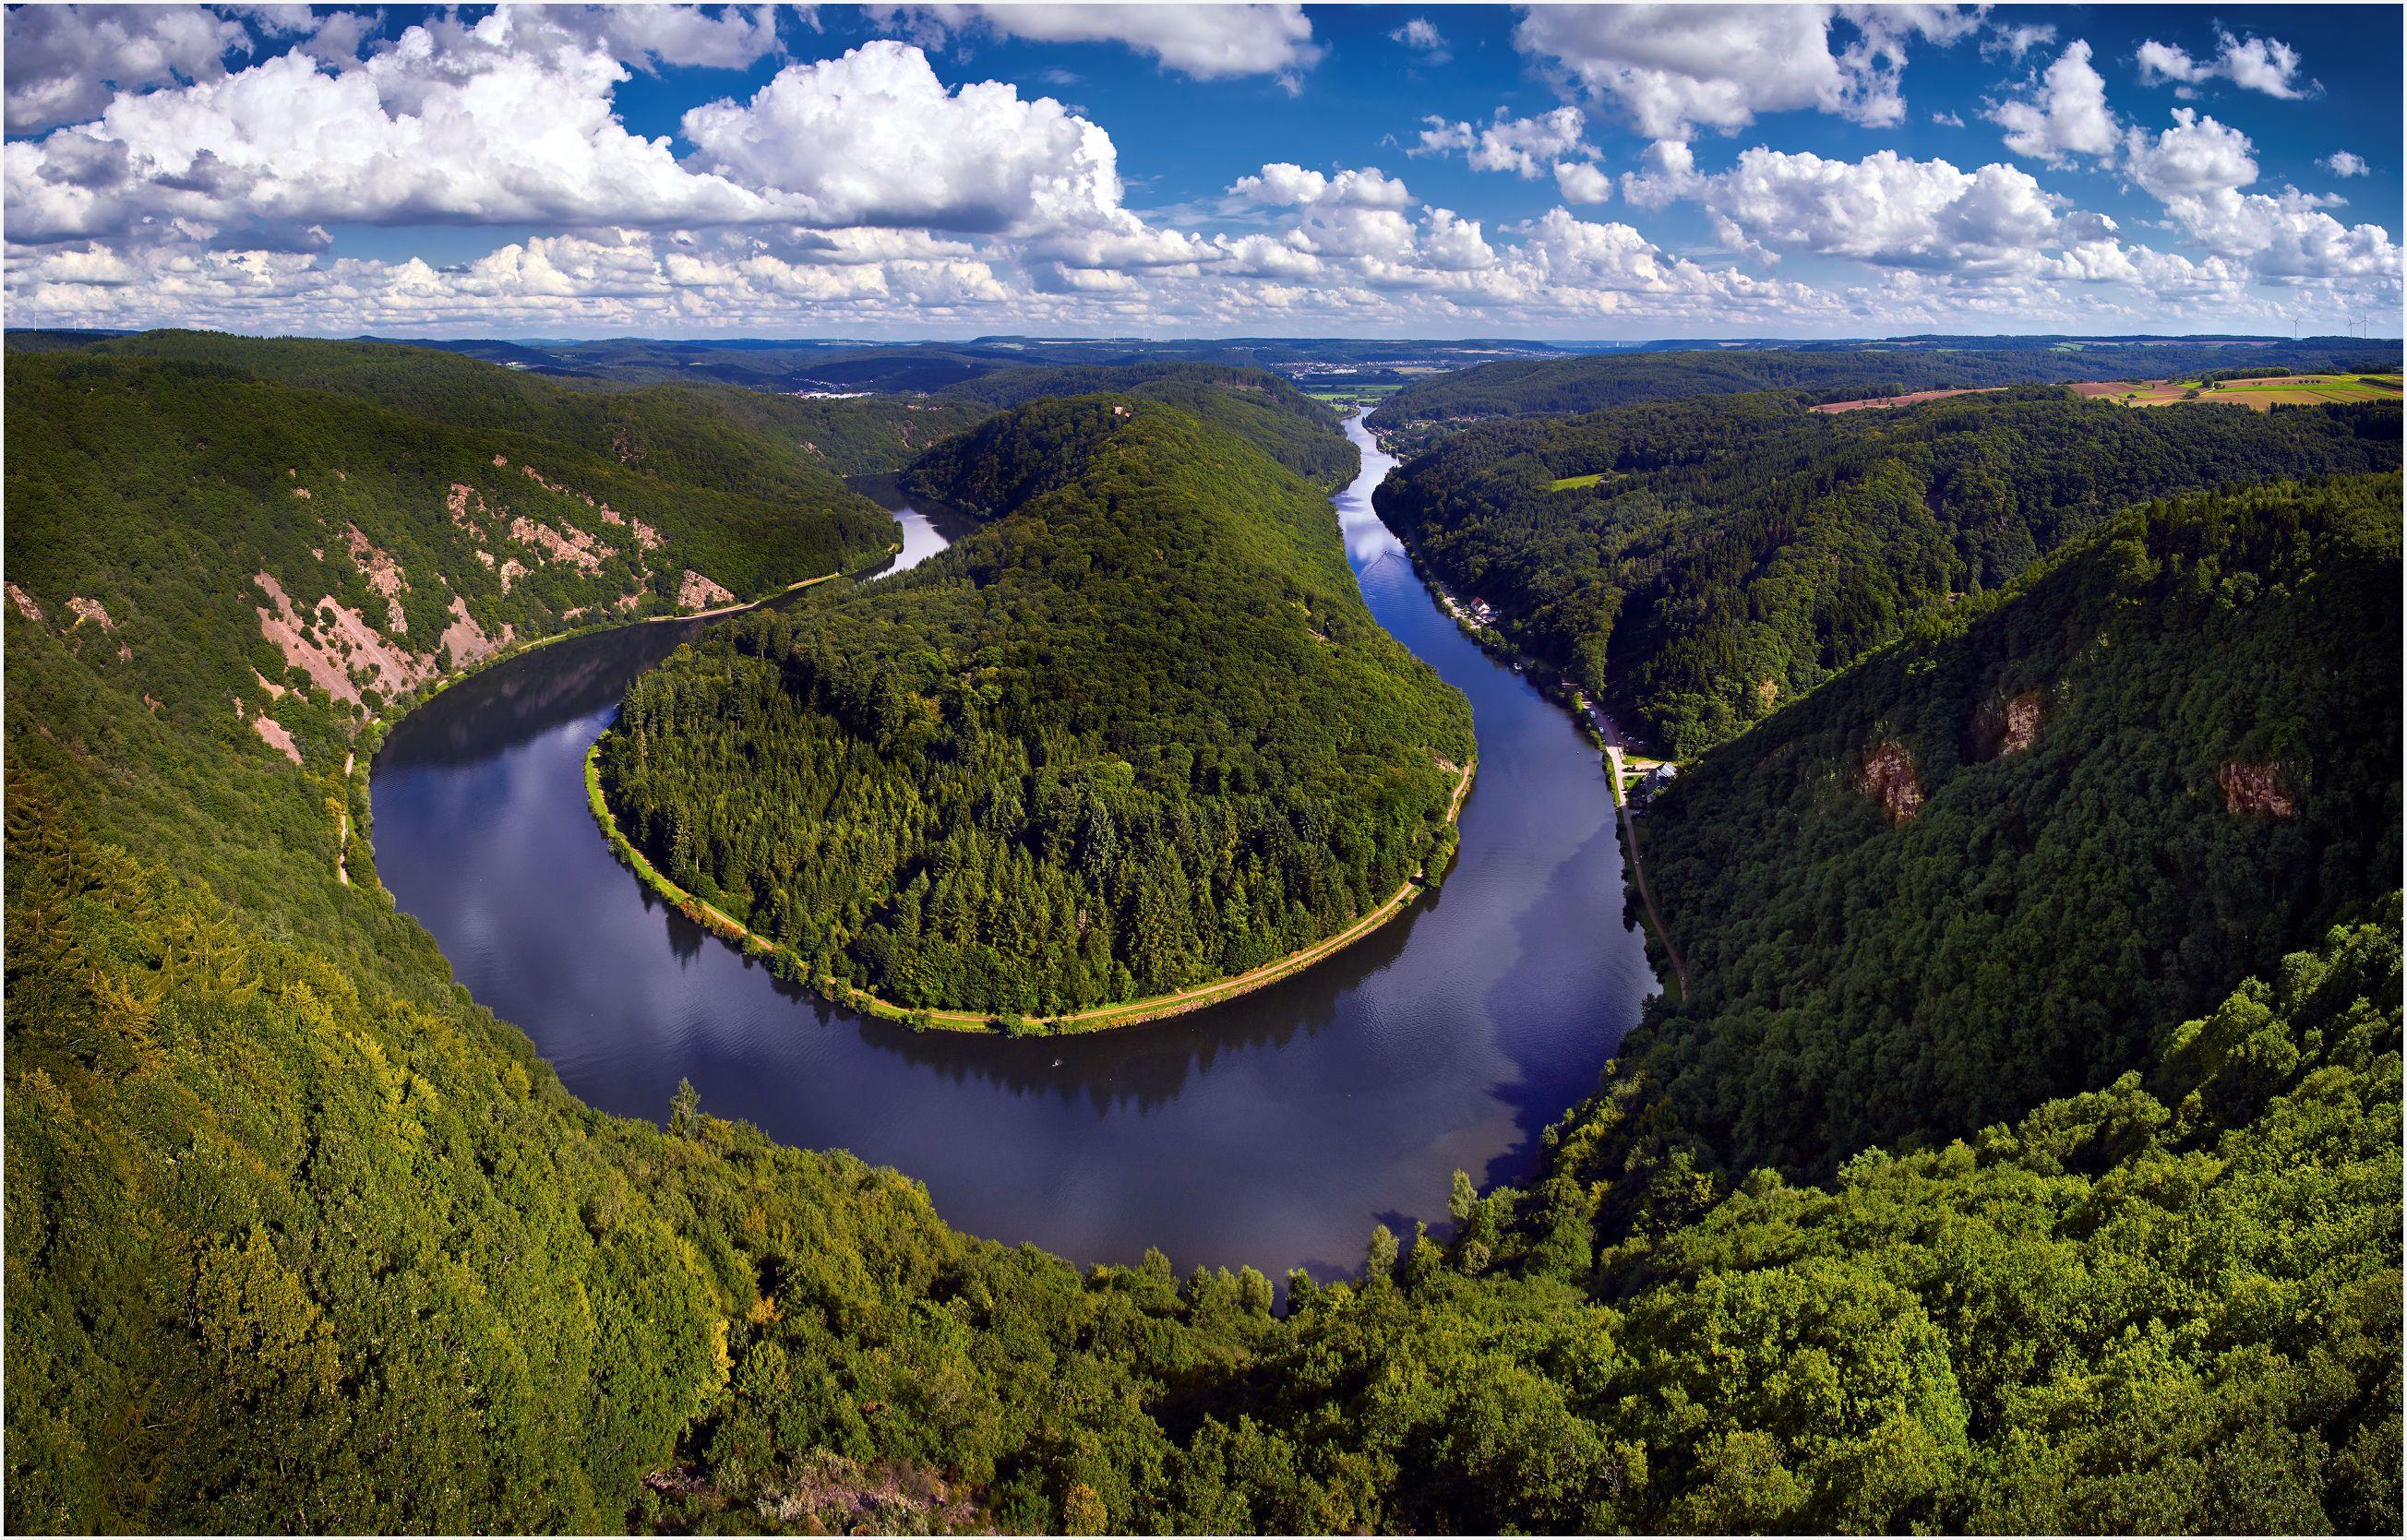 обои река Саар, Петля реки Саар в Метлахе, Германия, Метлах картинки фото